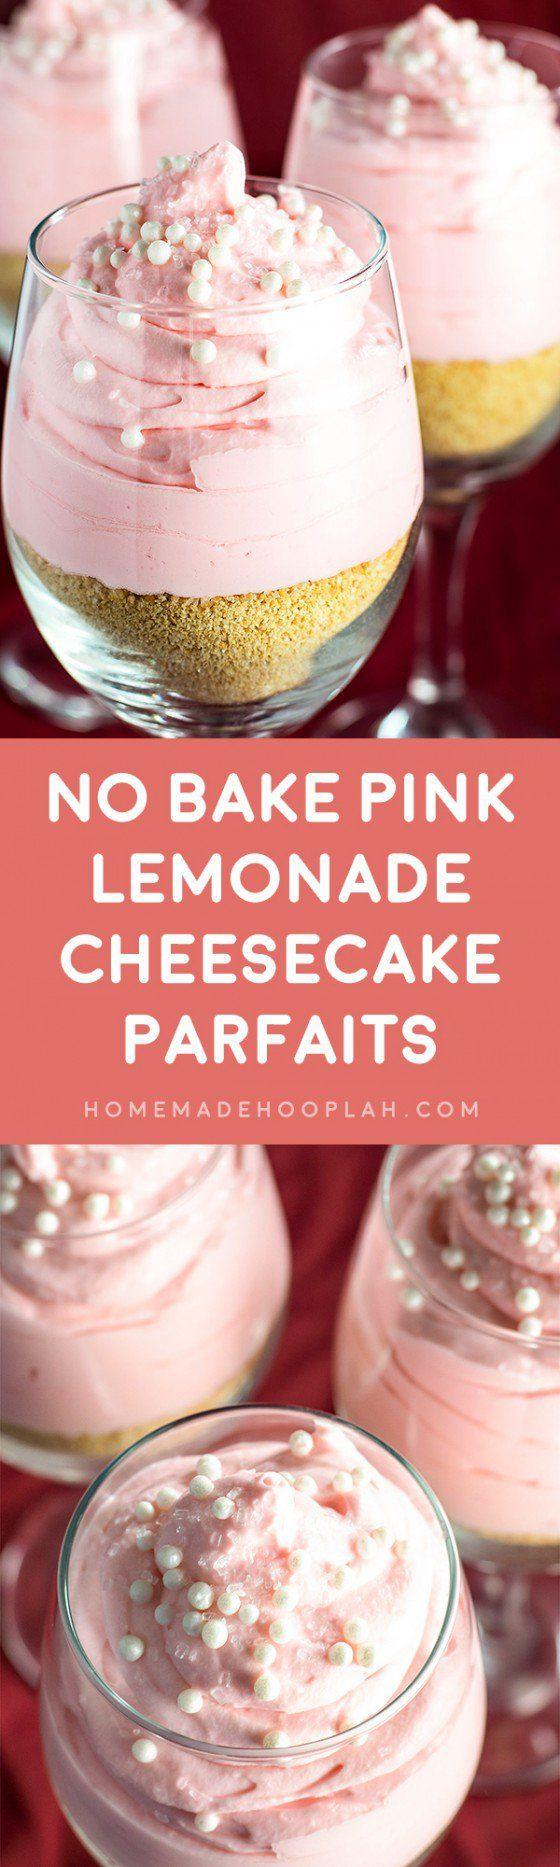 No Bake Pink Lemonade Cheesecake Parfaits! Single serve cheesecake parfaits with a hint of pink lemonade flavor. | HomemadeHooplah.com